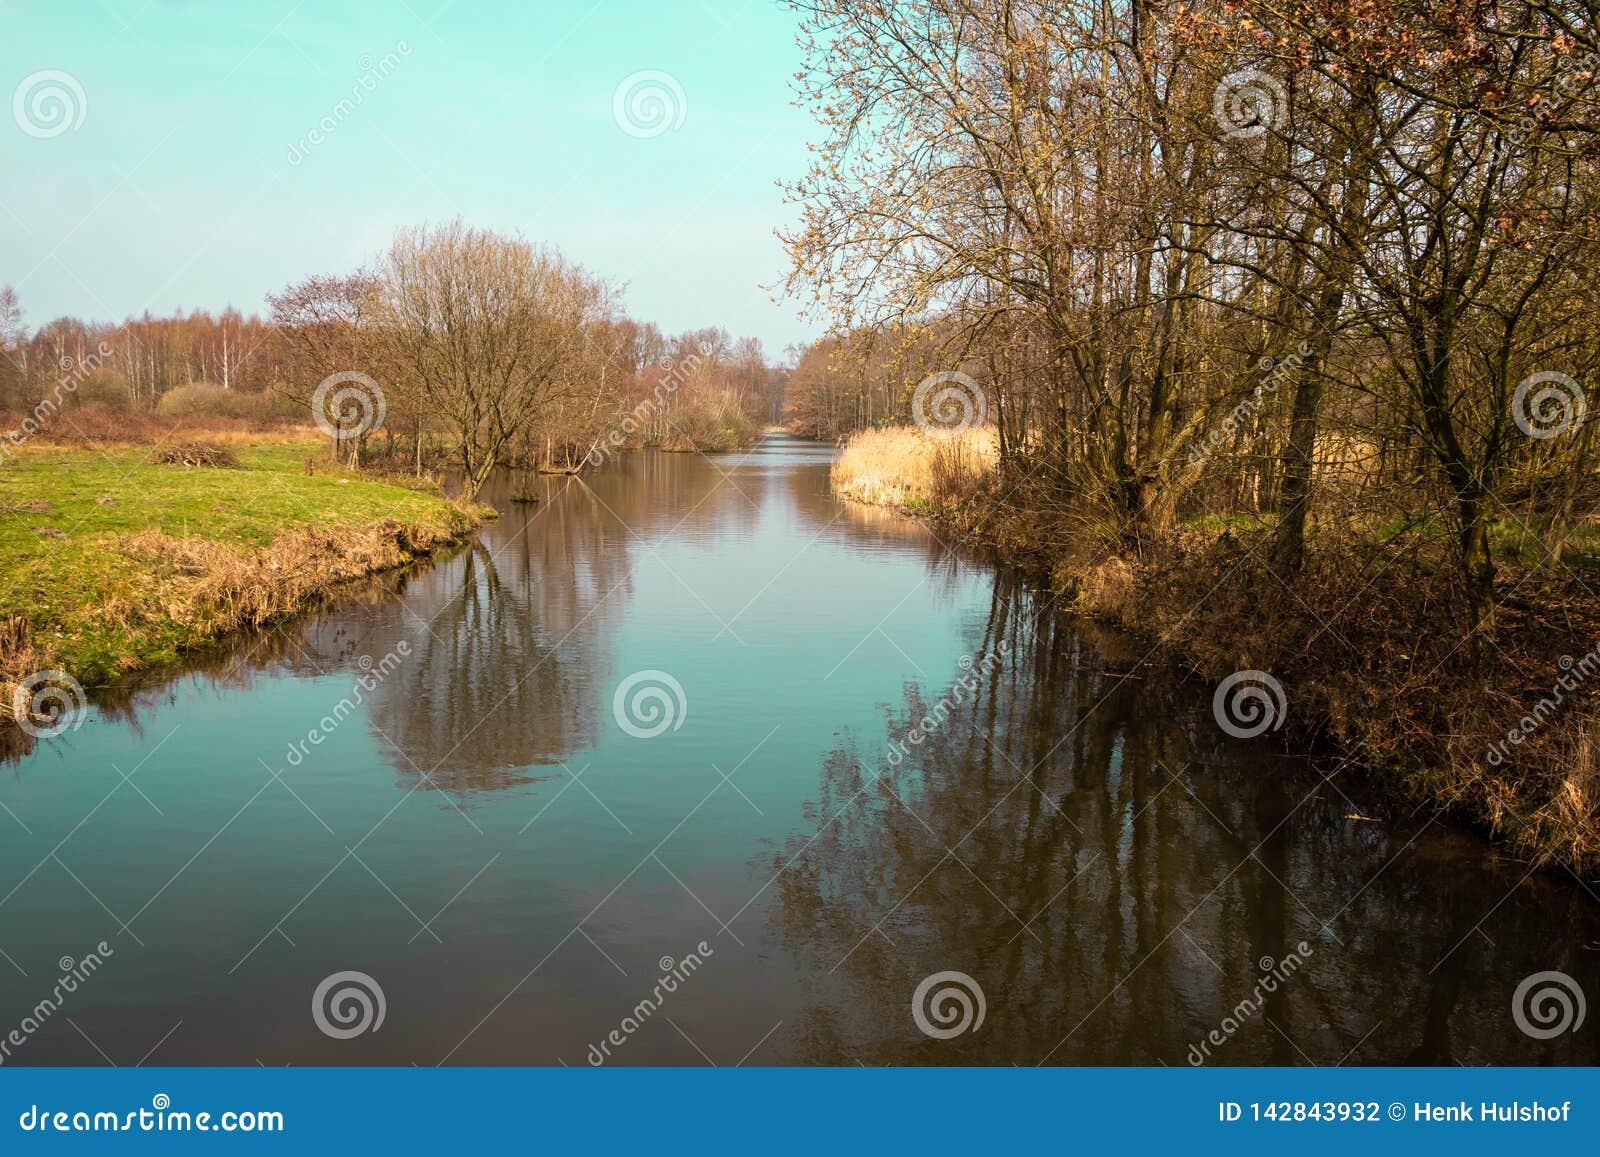 Canalize o Zandwetering Hengforden próximo